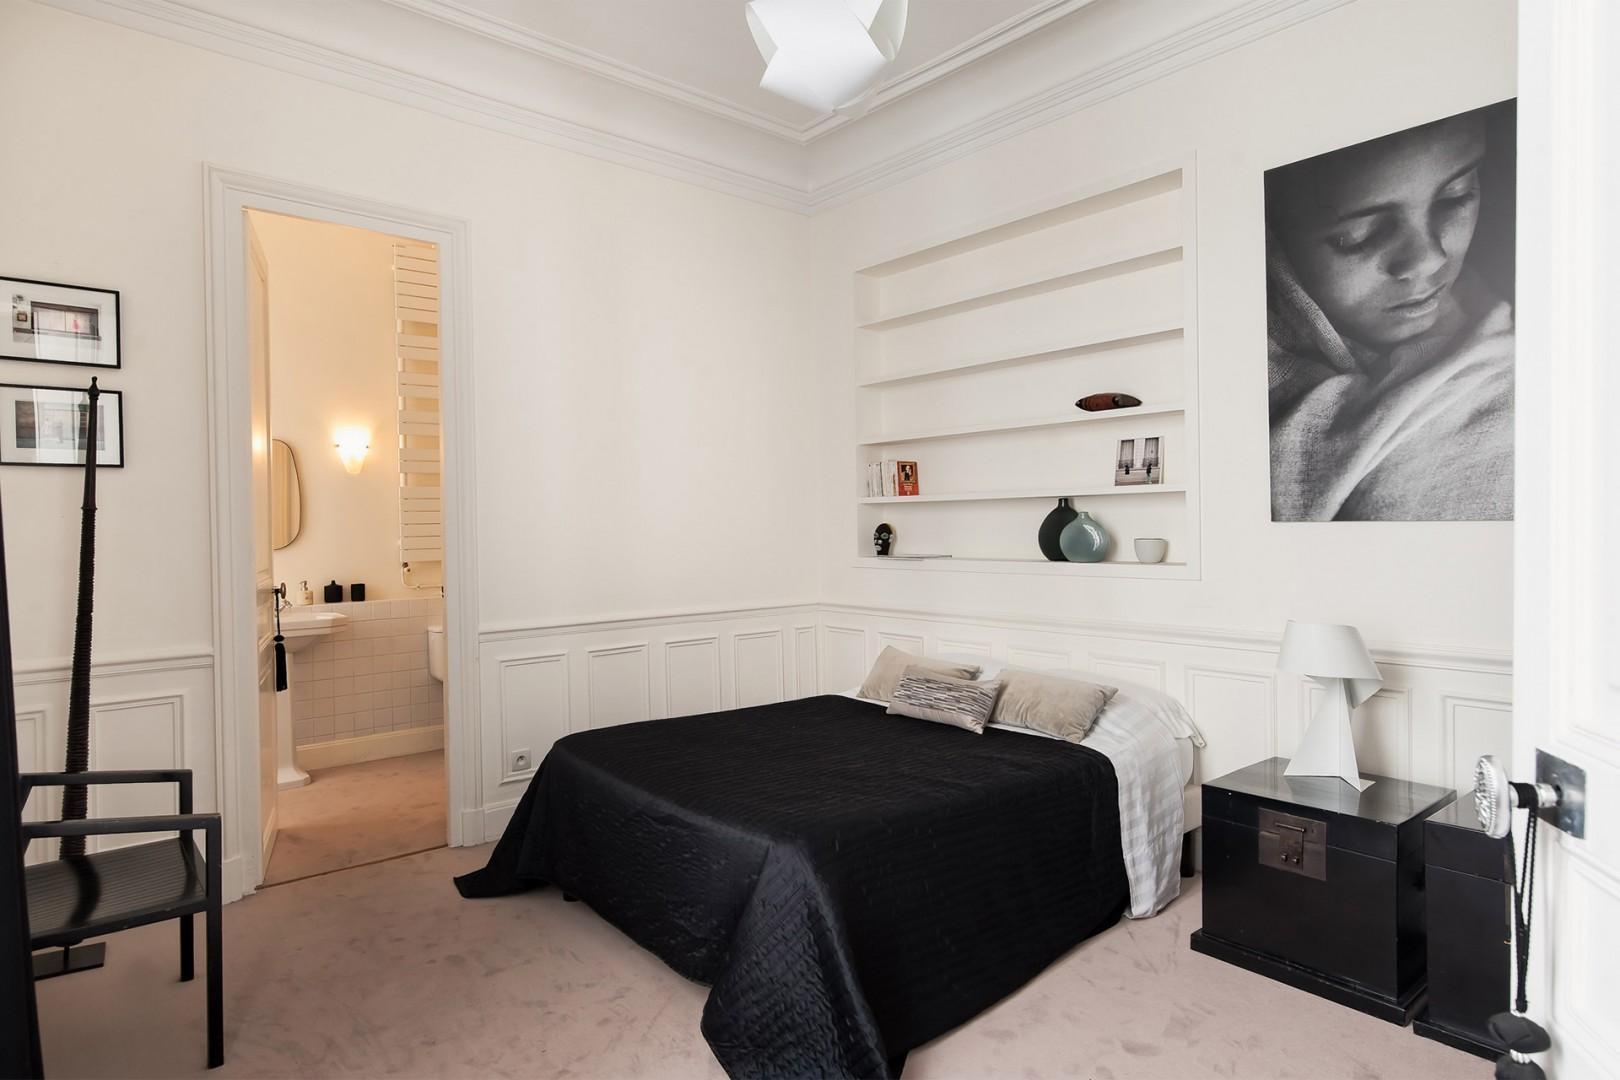 The separate bedroom 3 comes with an en suite bathroom.